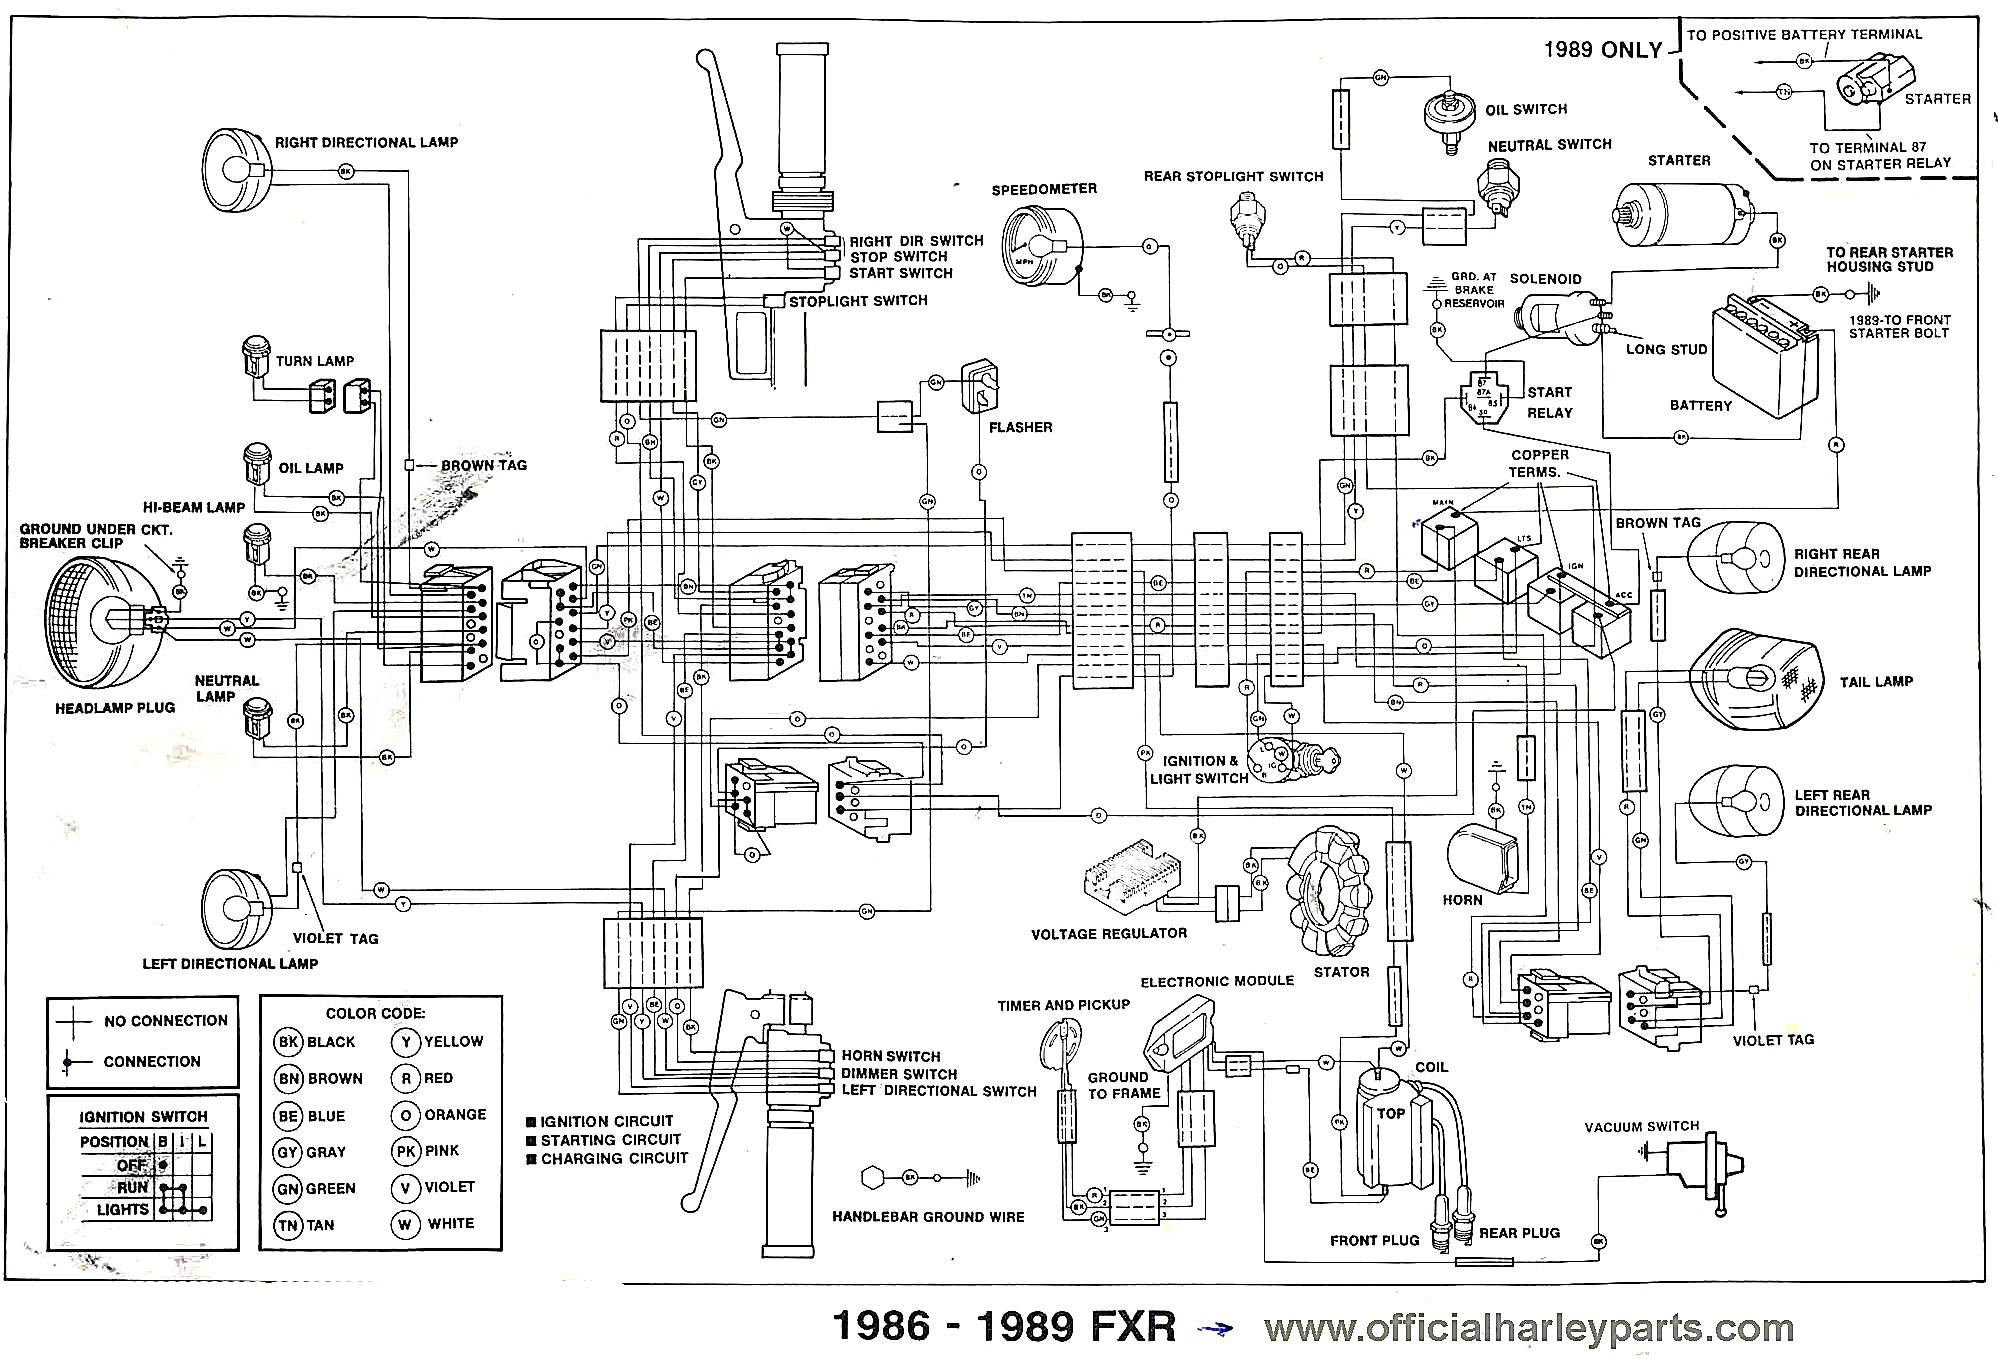 Harley davidson headlight wiring diagram best of wiring diagram image harley davidson wiring diagram magnificent model diagrams and schematics best sportster swarovskicordoba Images